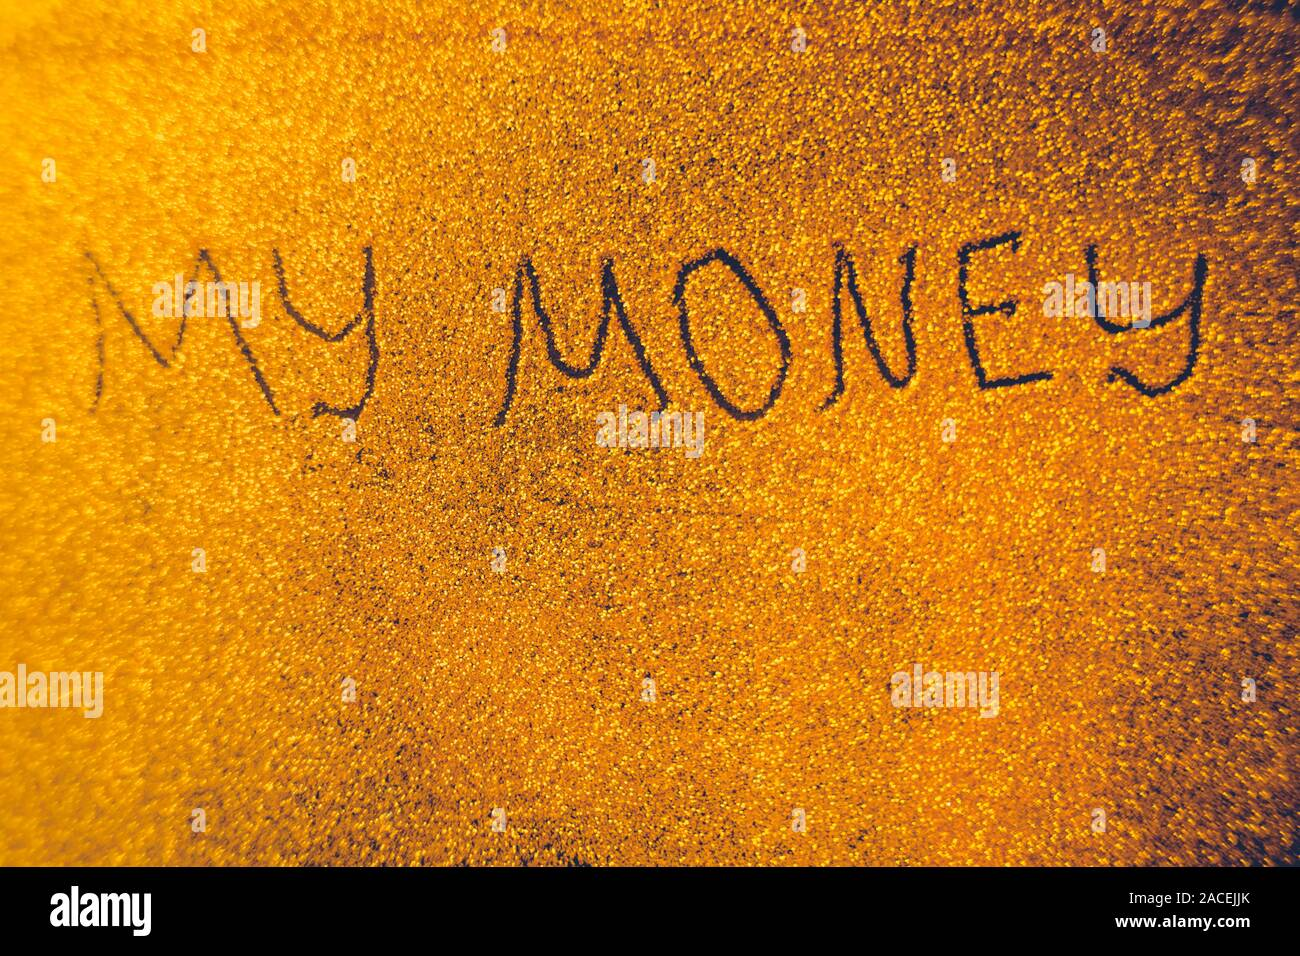 Text My Money on golden rich shiny background. Stock Photo